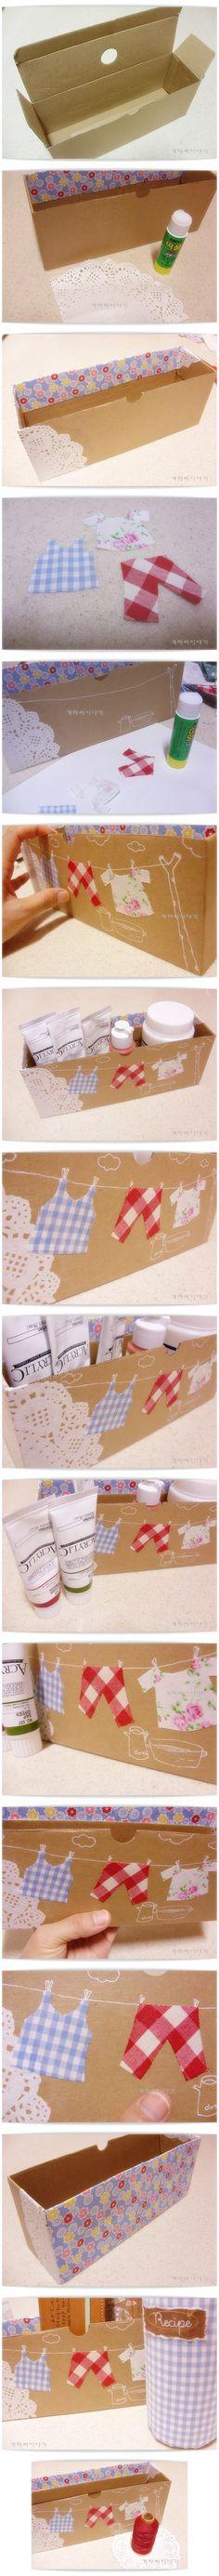 Reform_paper box